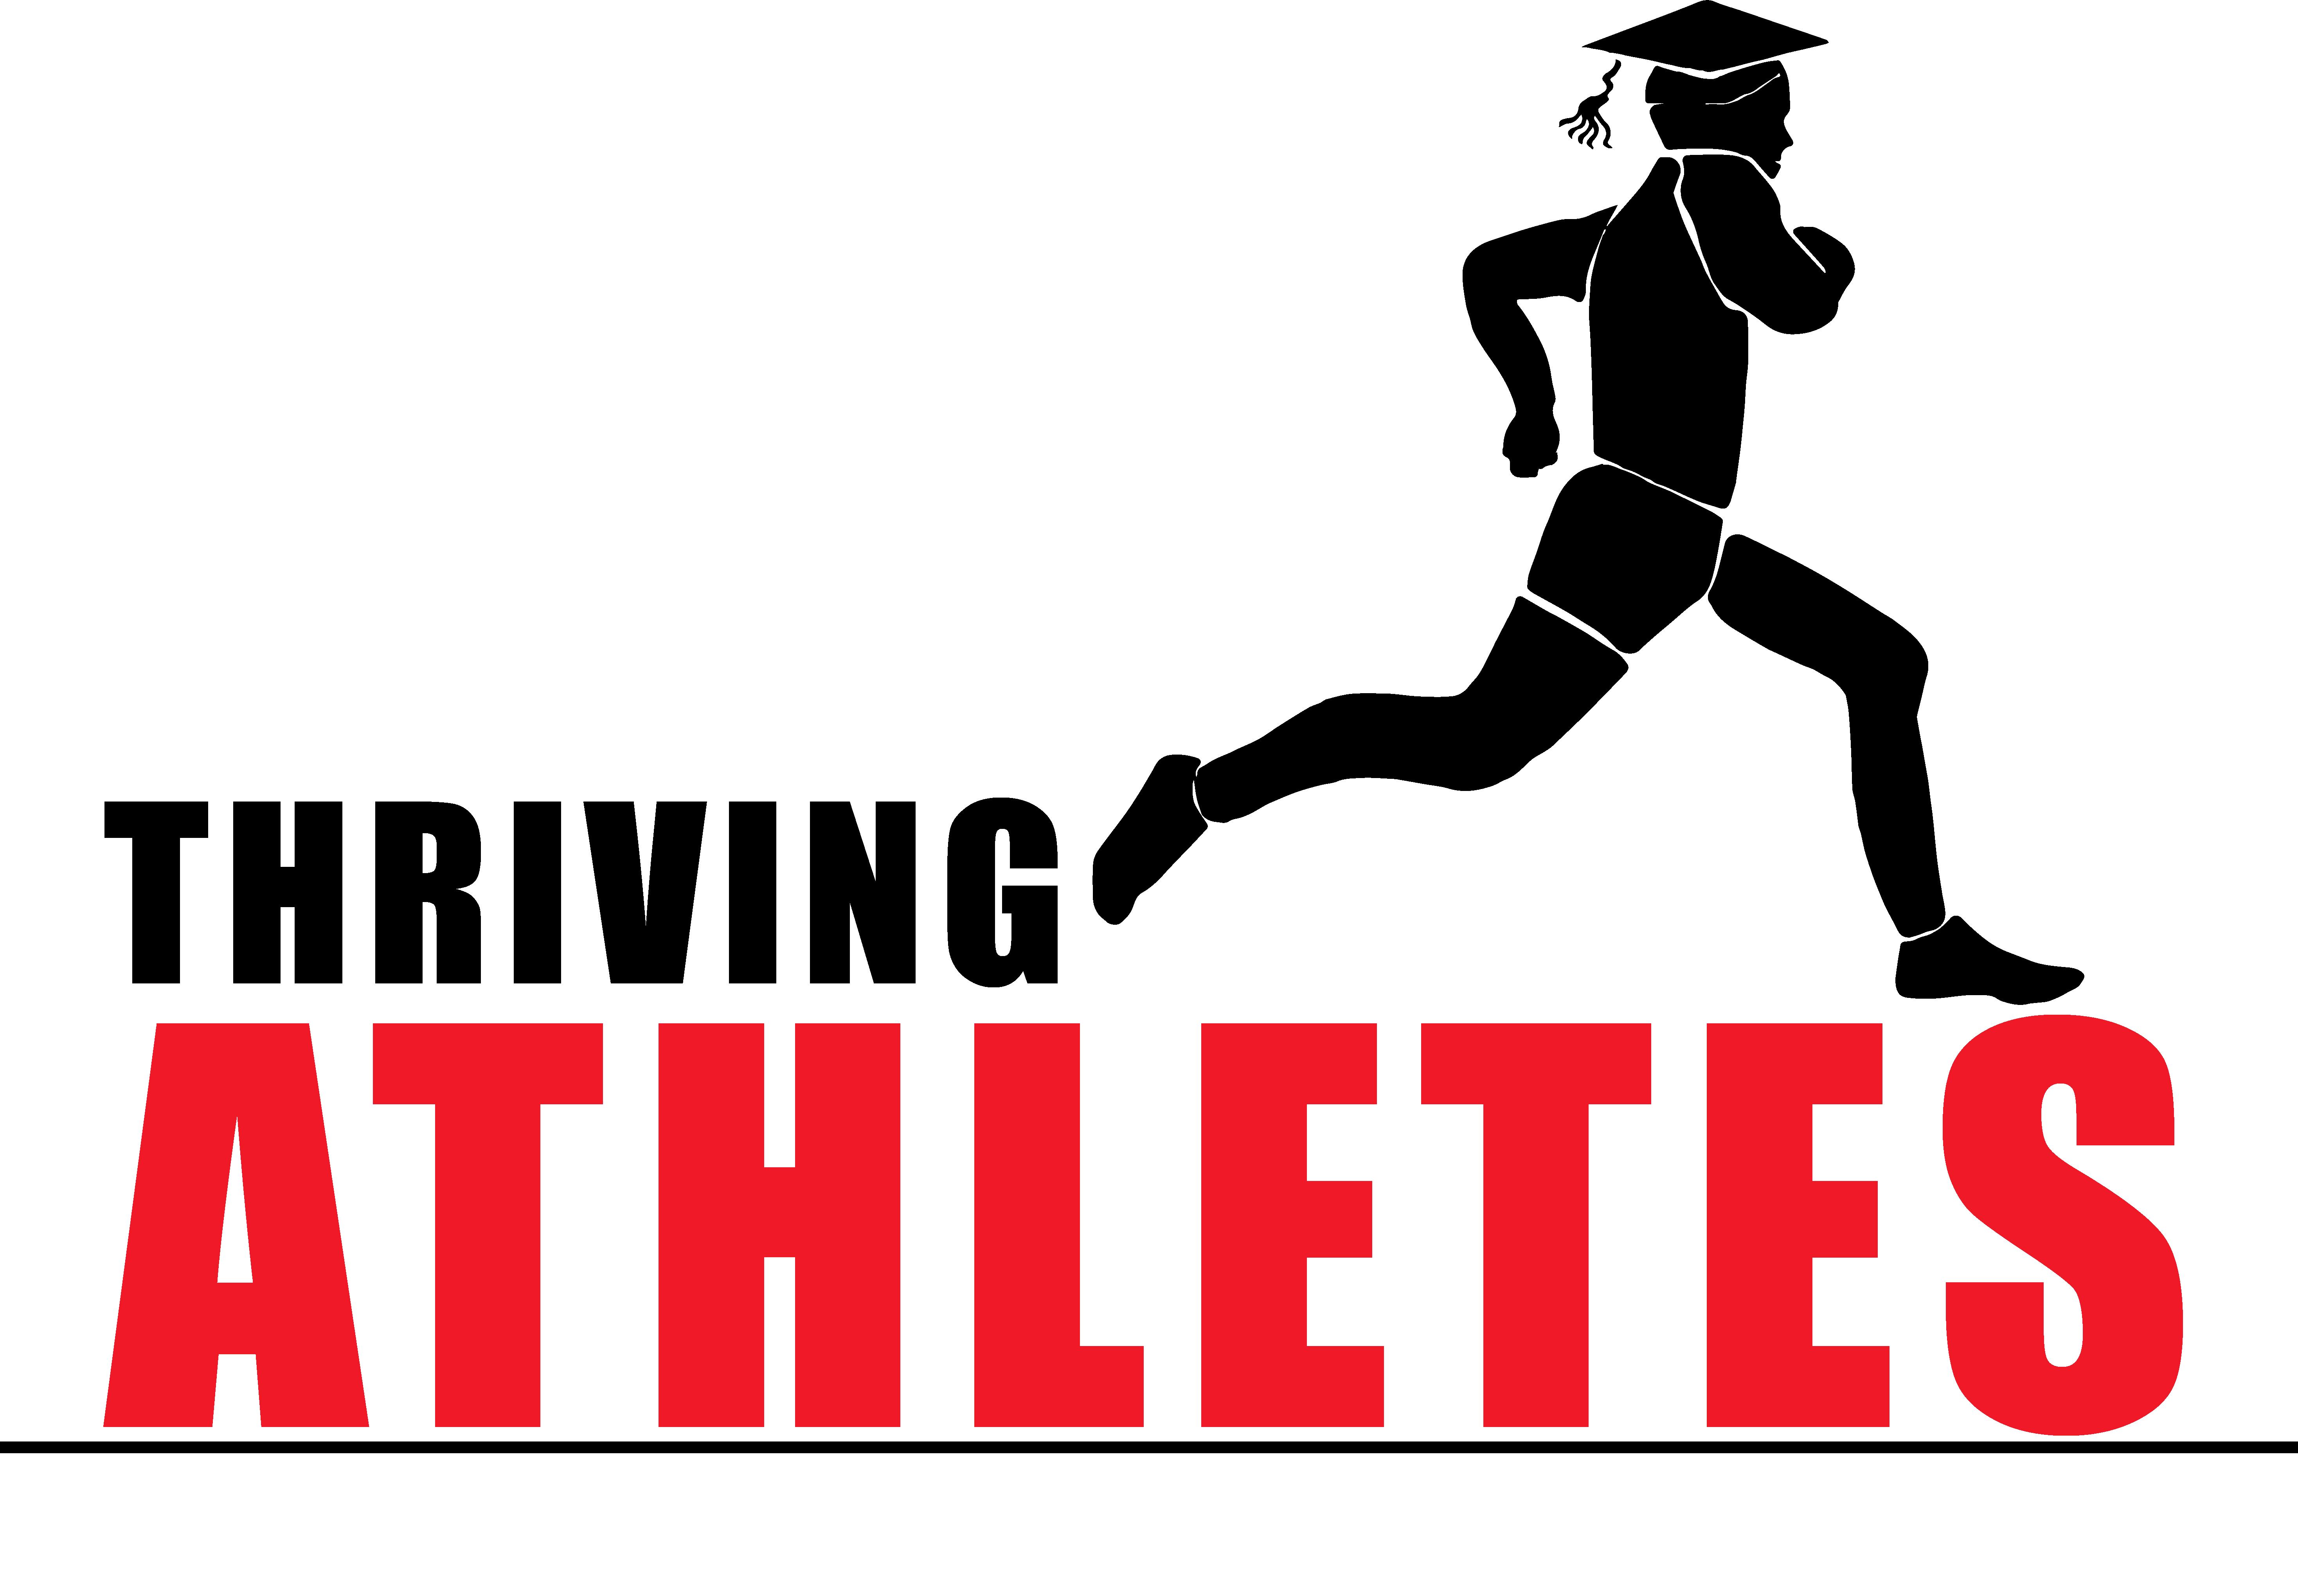 Thriving Athletes